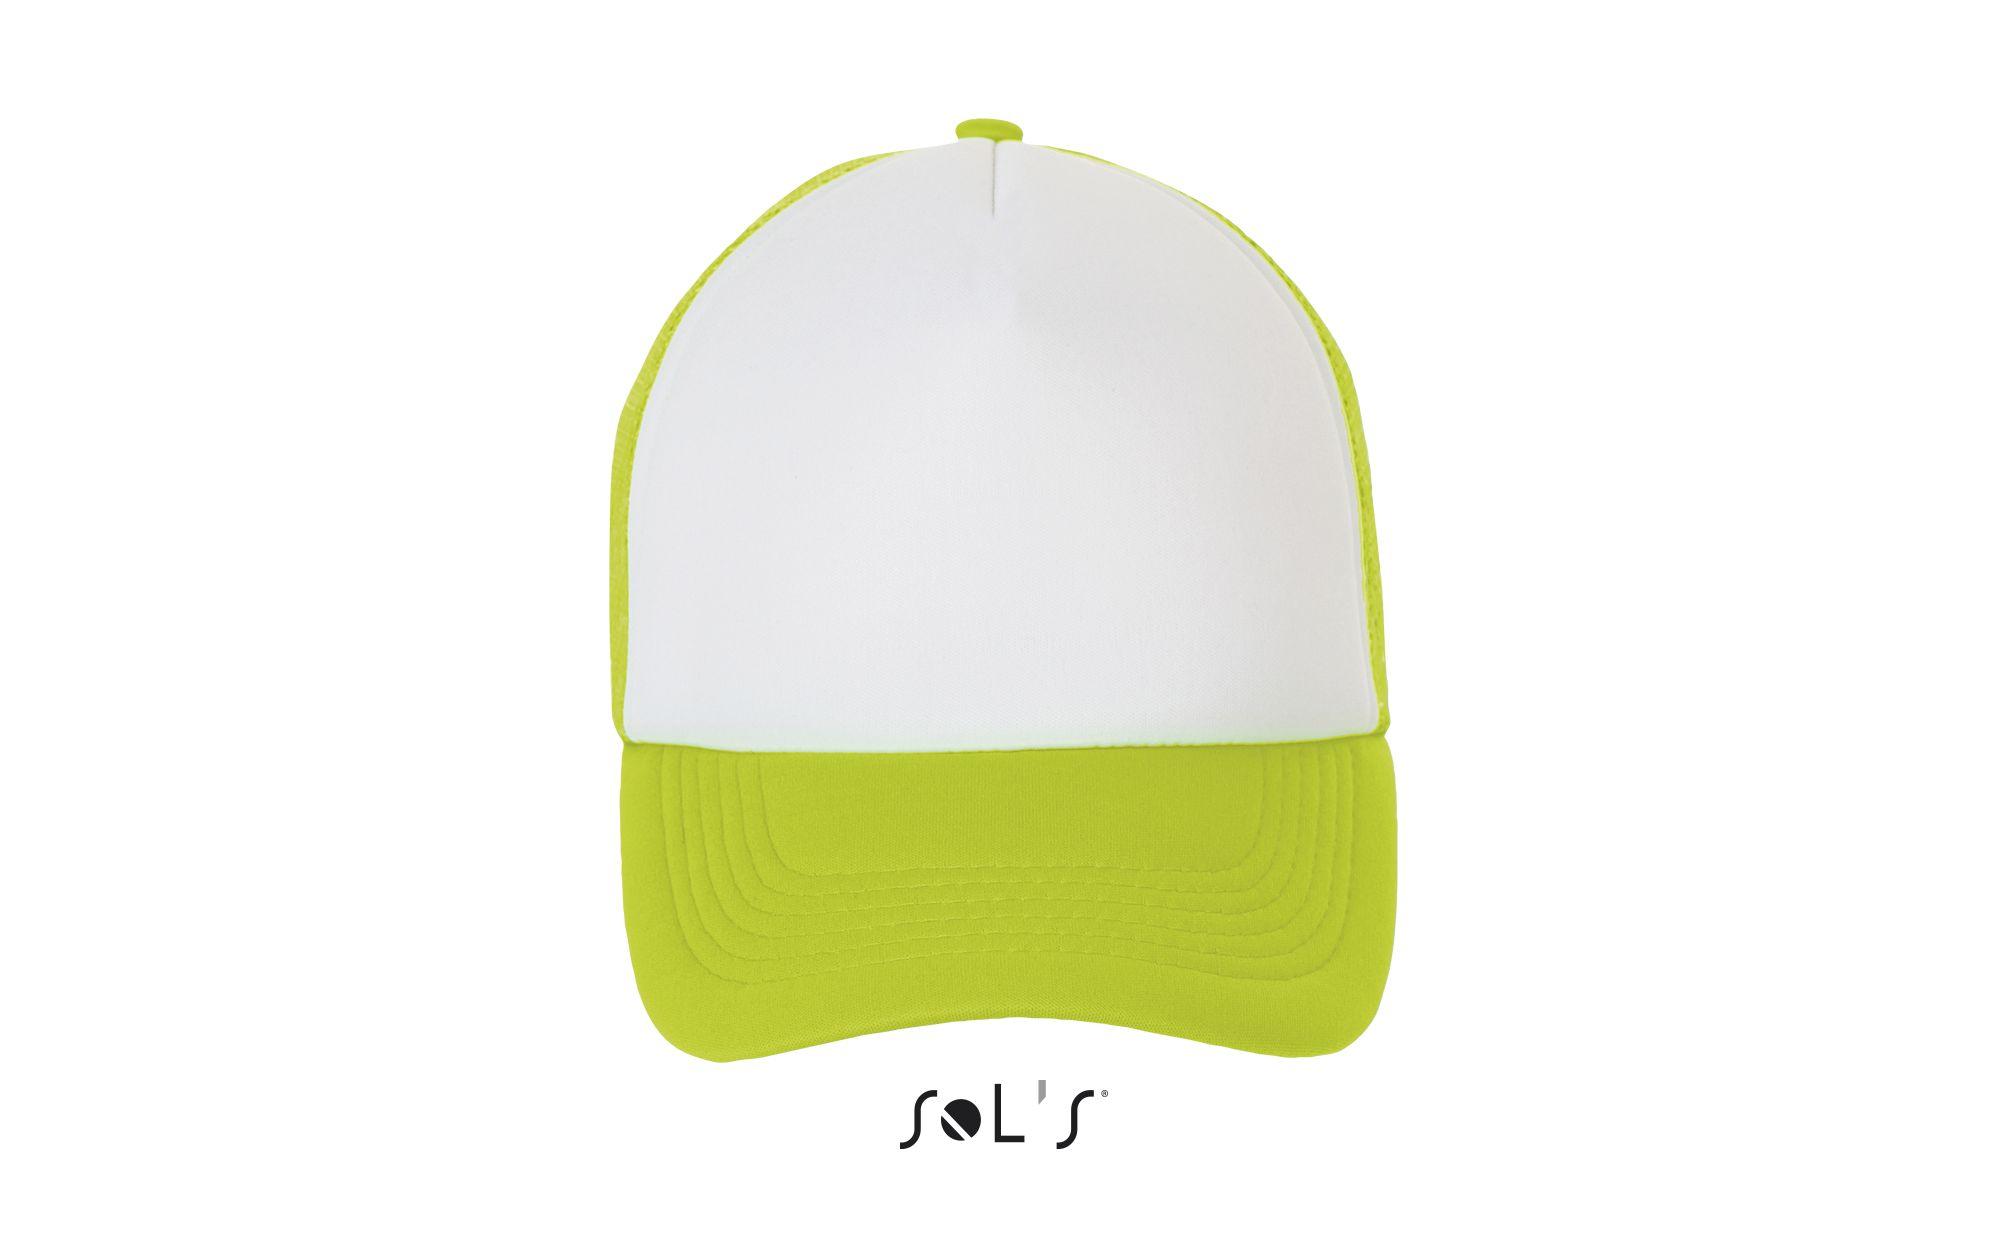 516 - Blanc / Vert fluo